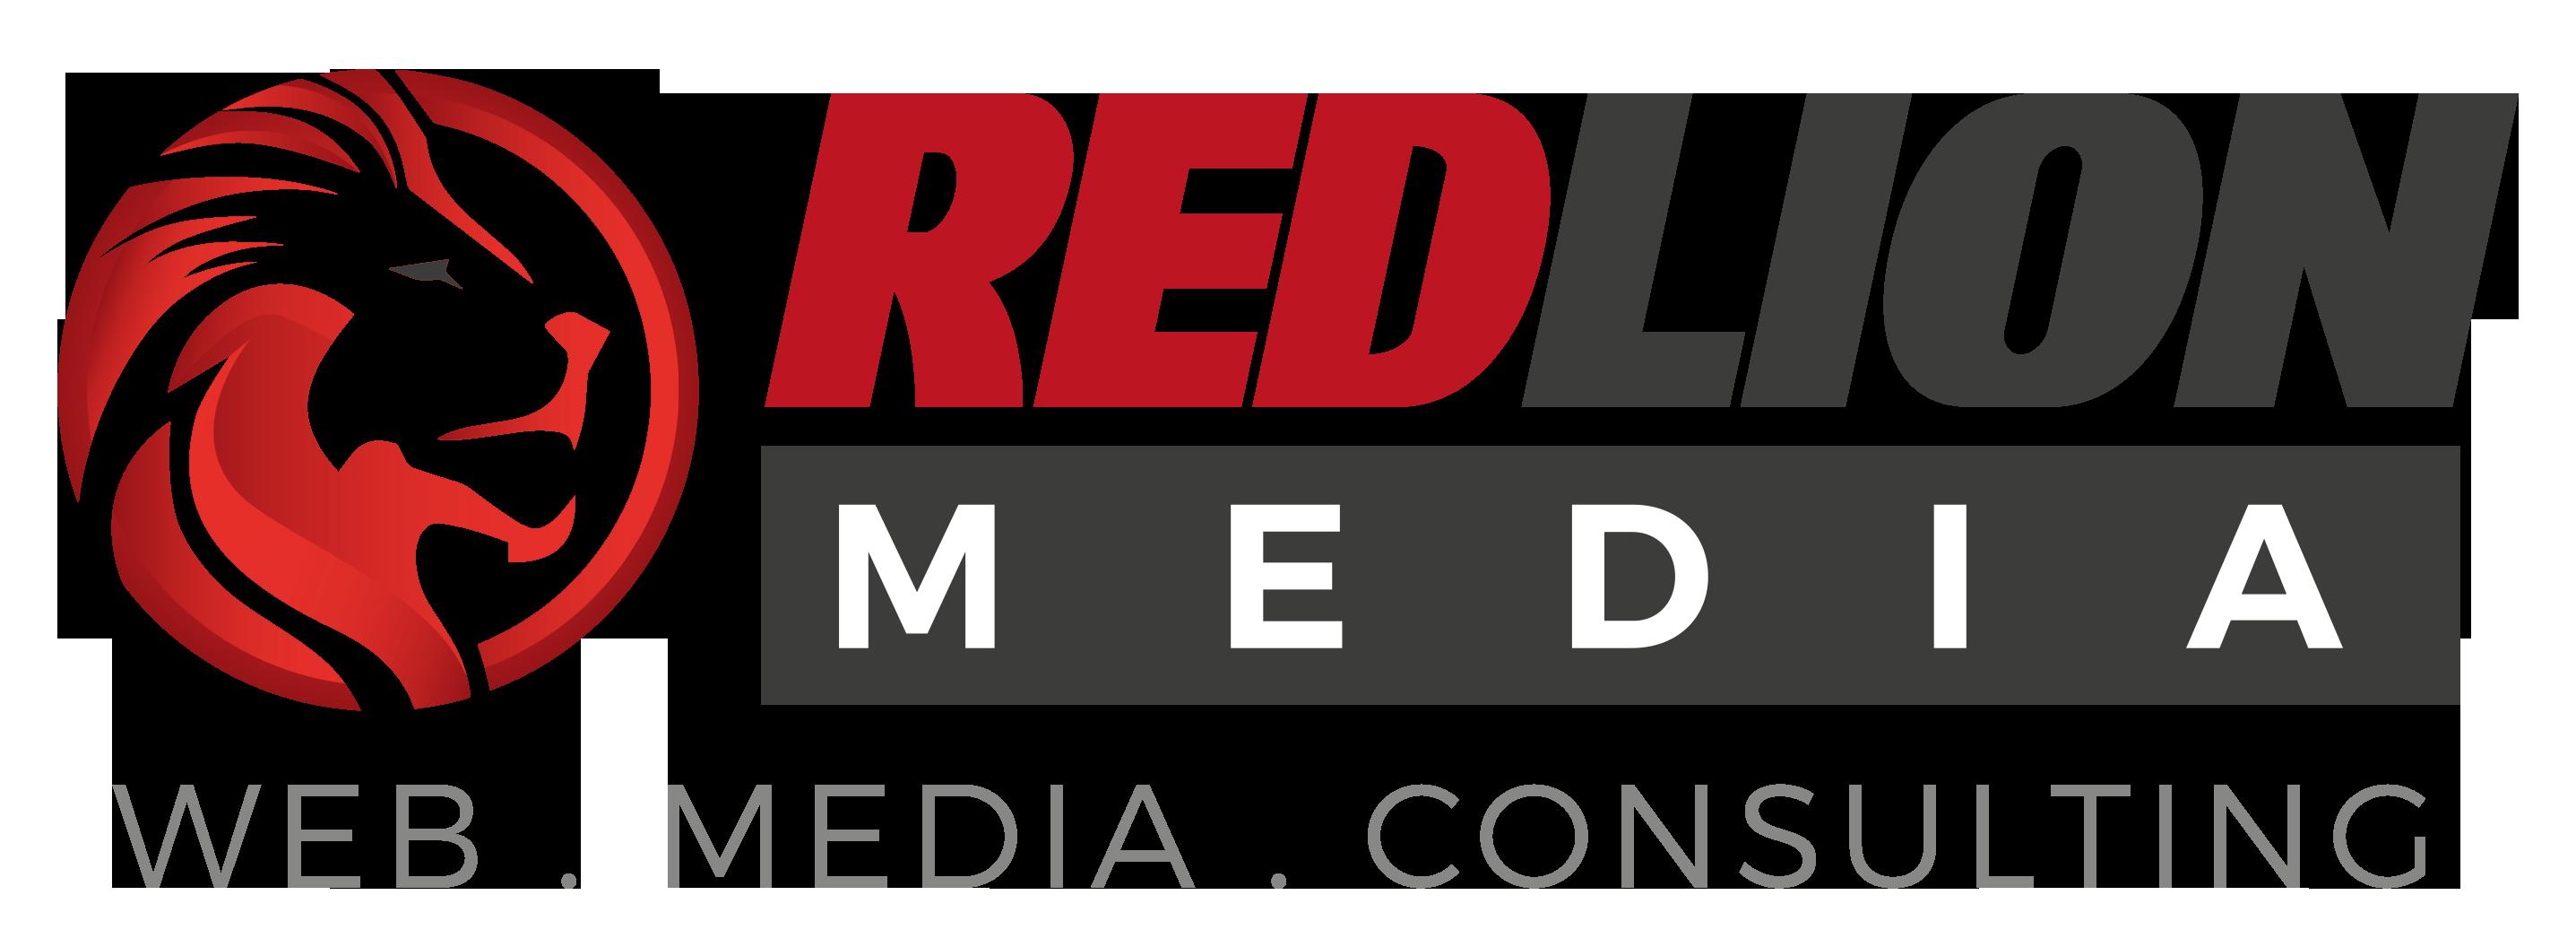 Logo redlion media Agentur